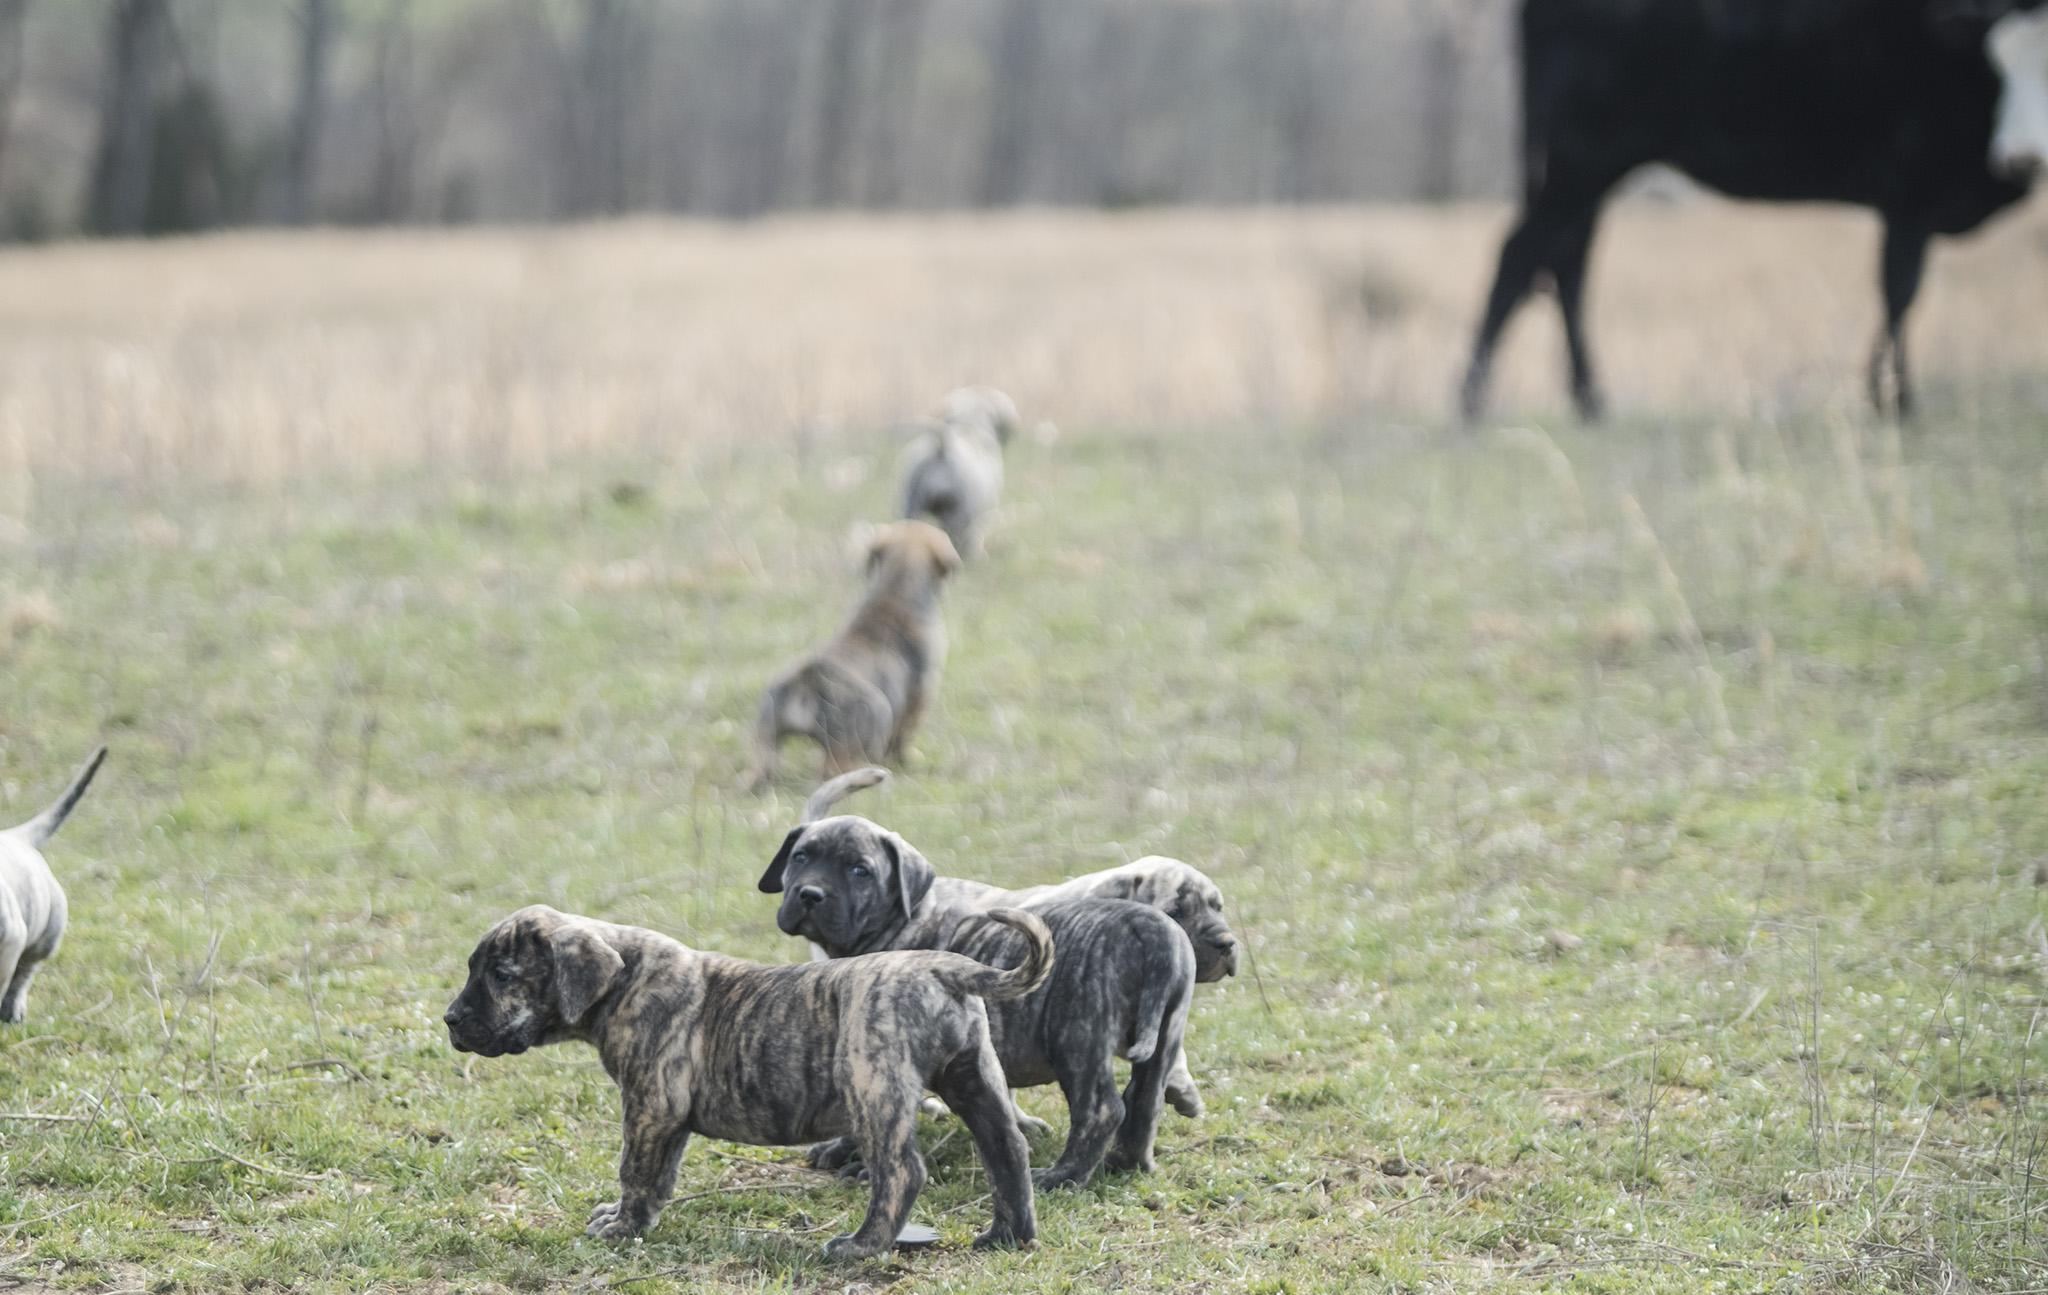 Puppies exploring the farm